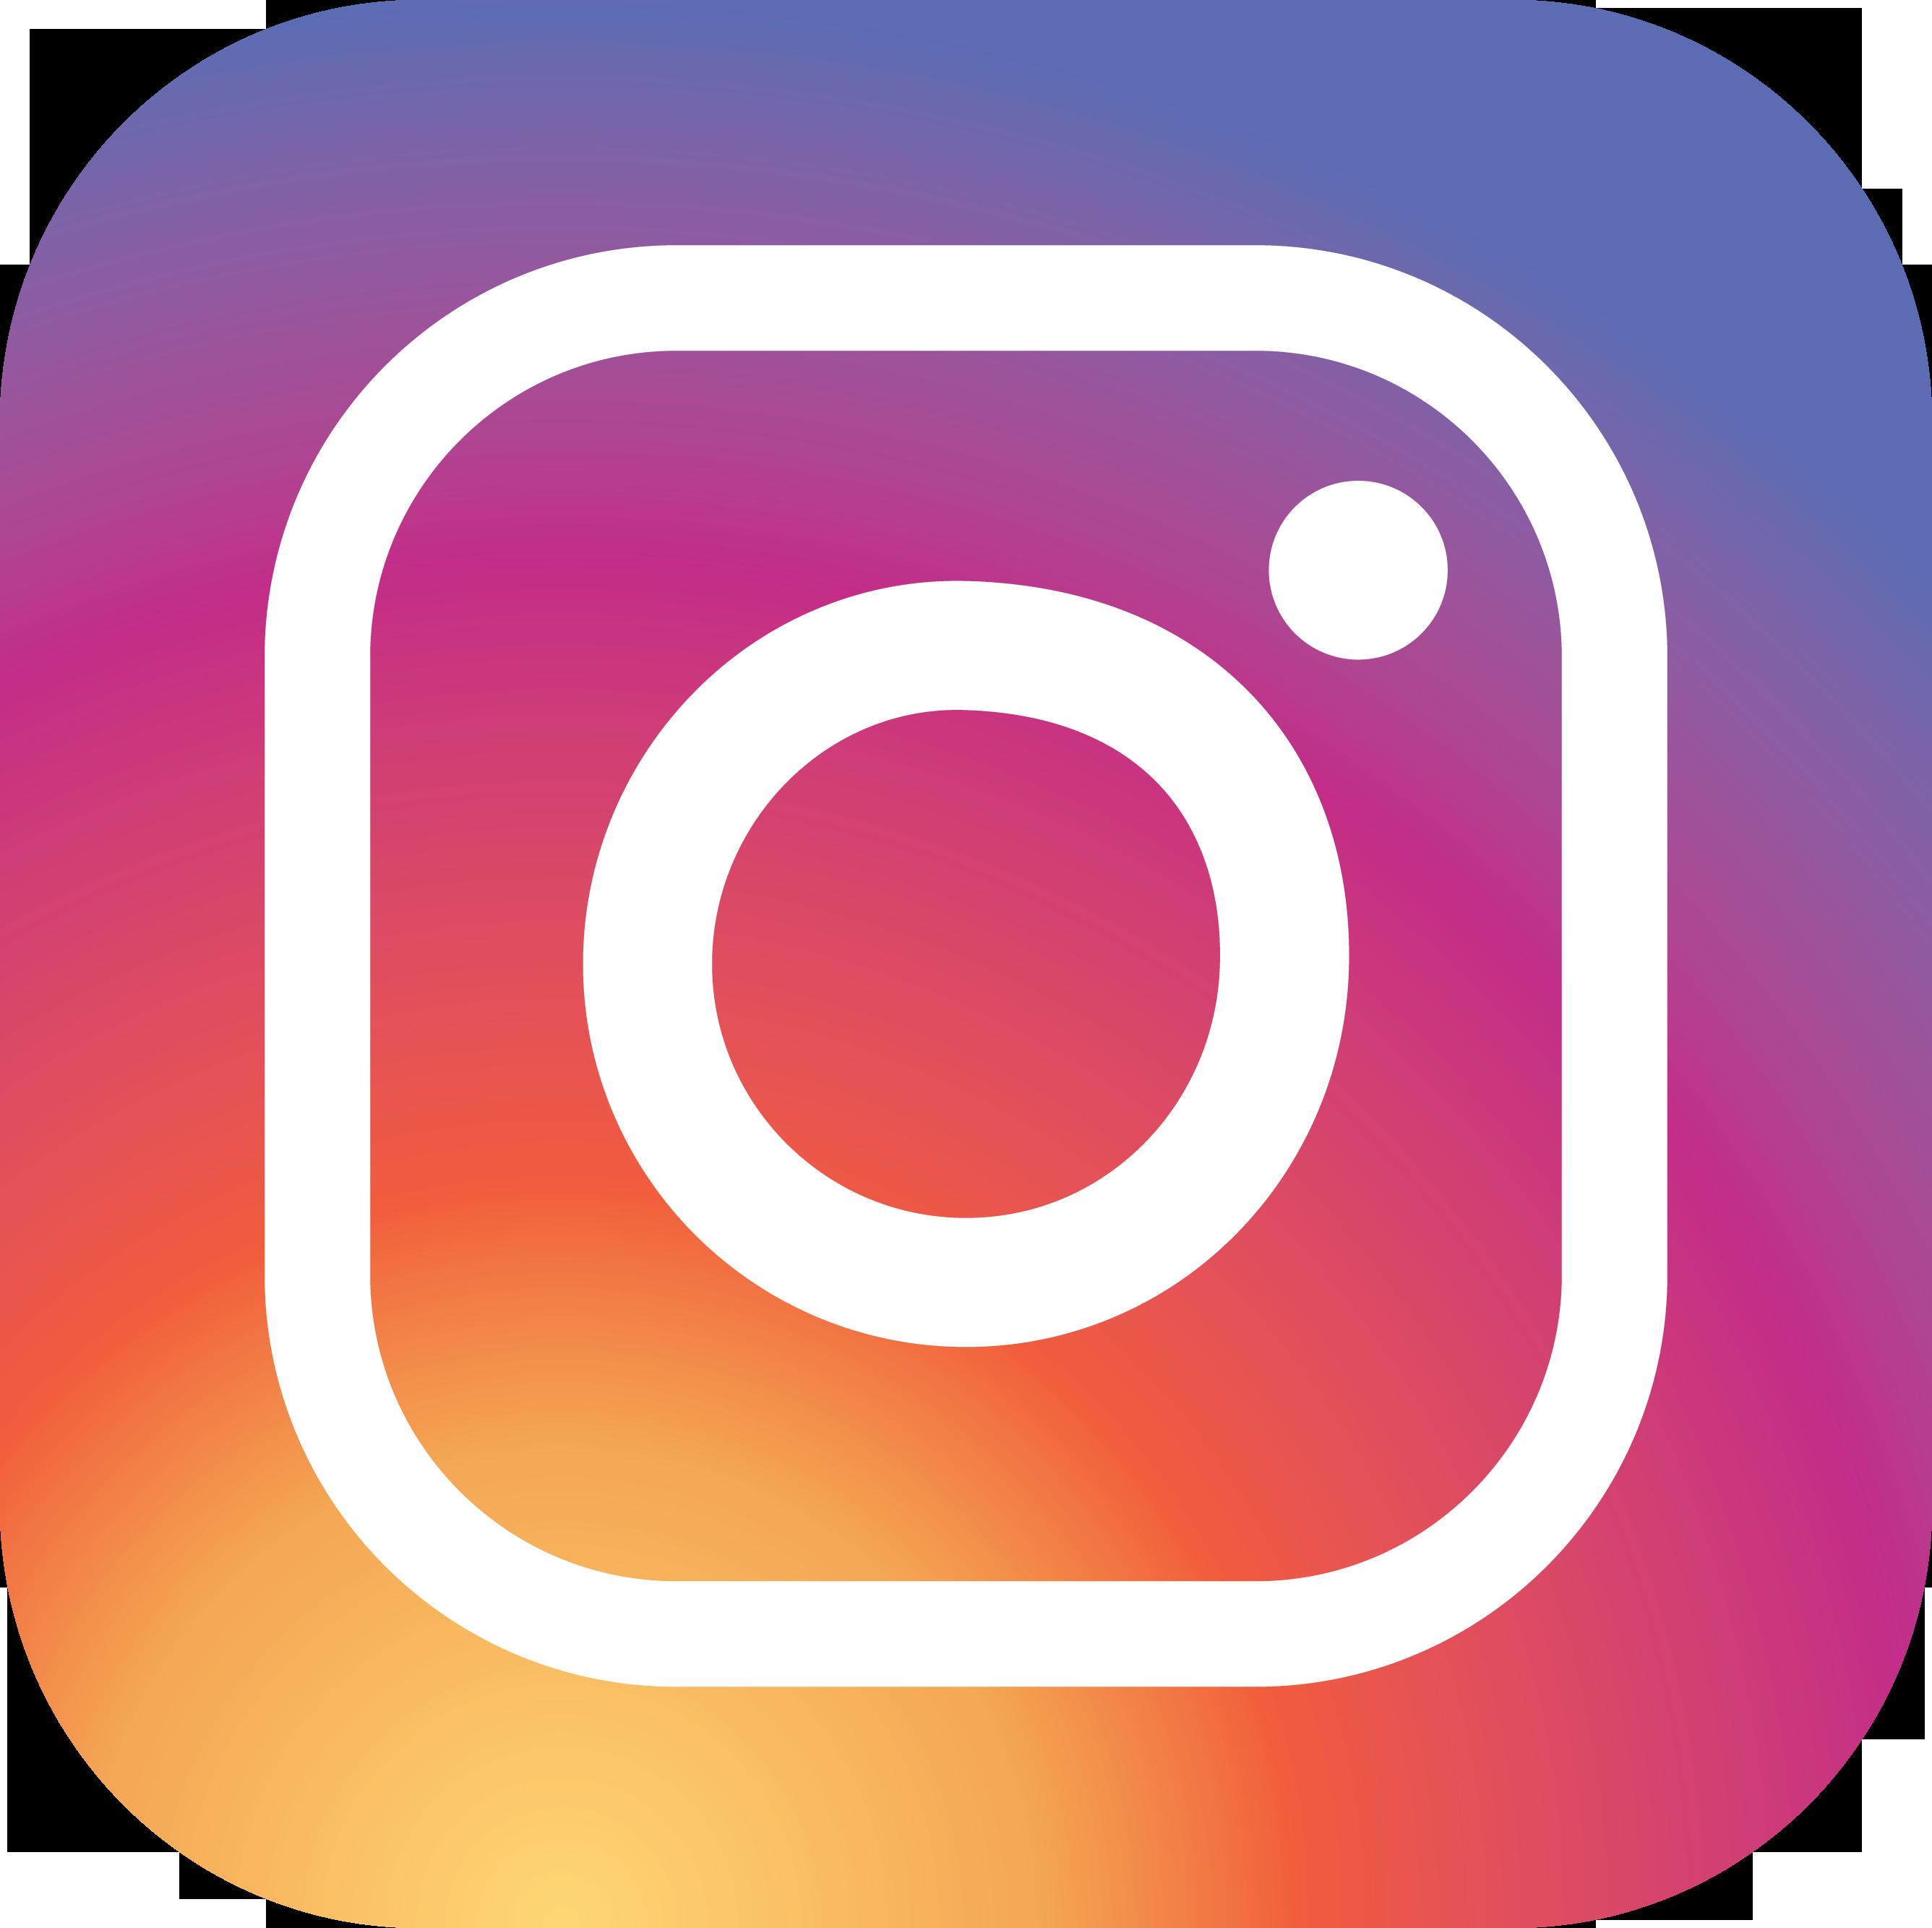 Segui Ottica 3 Valli su Instagram